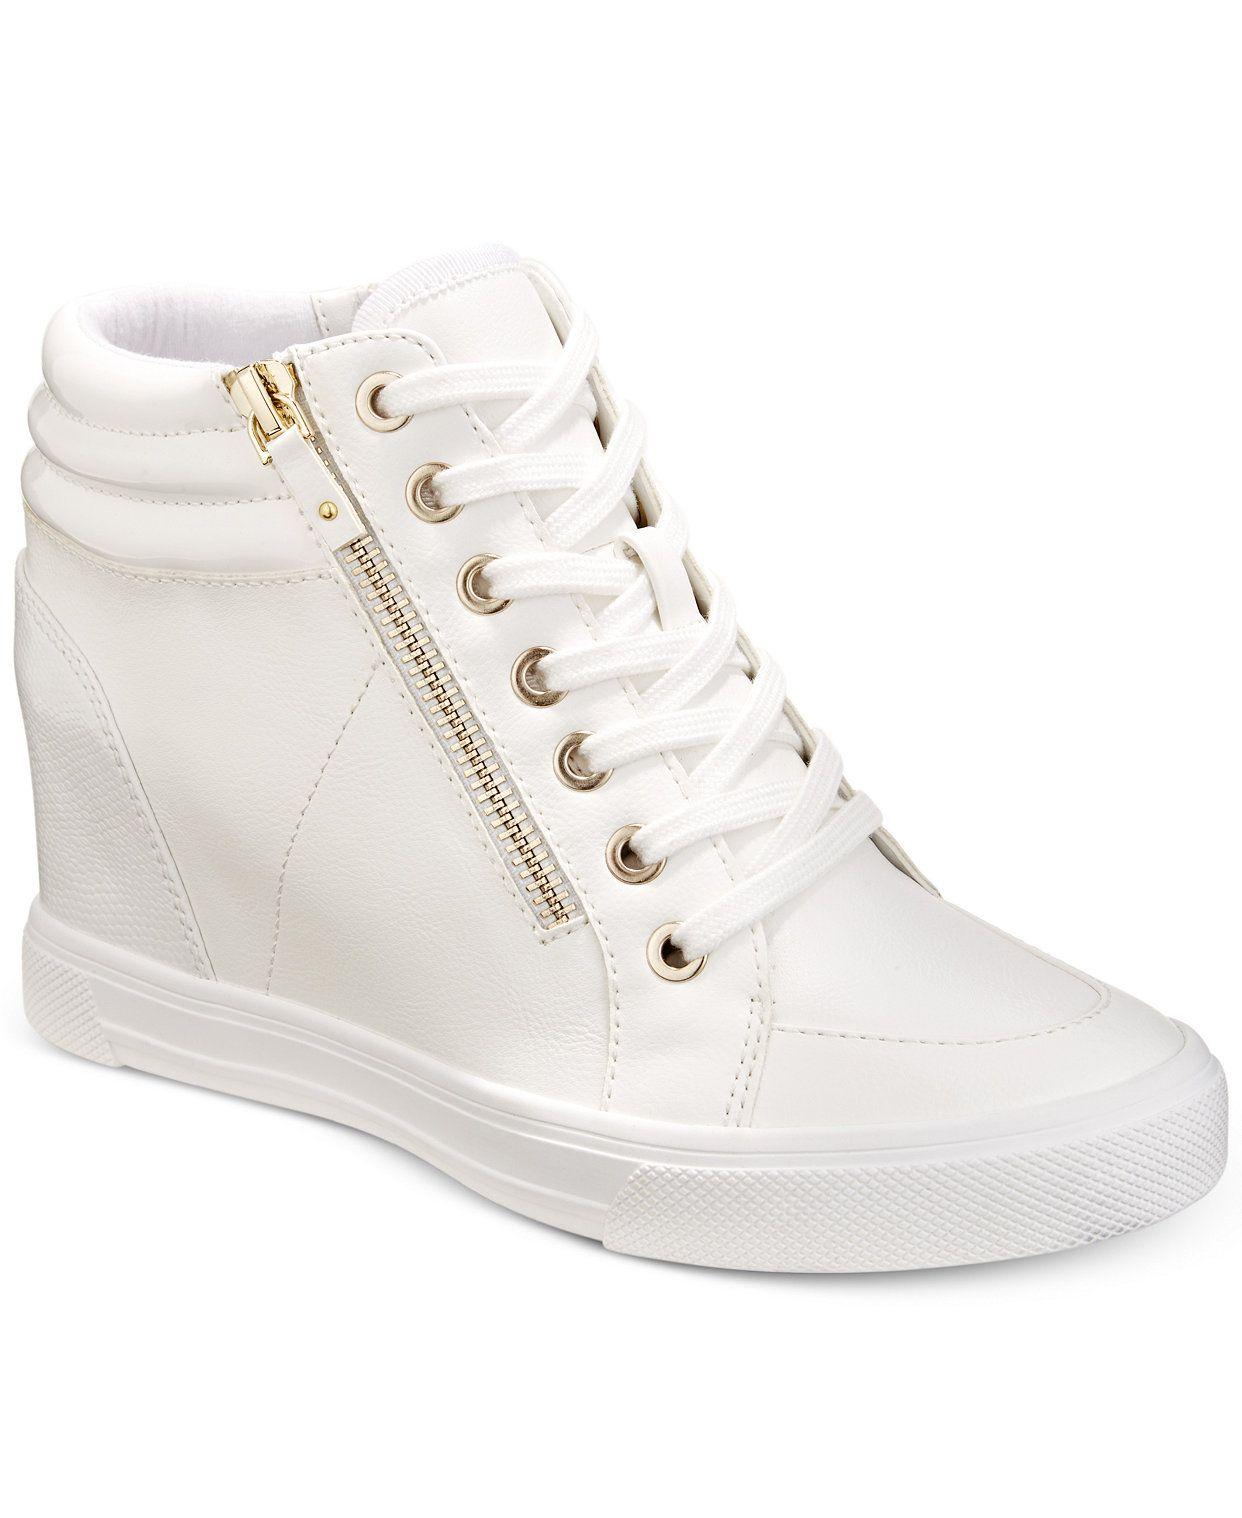 Women's Kaia Wedge Sneakers in 2020